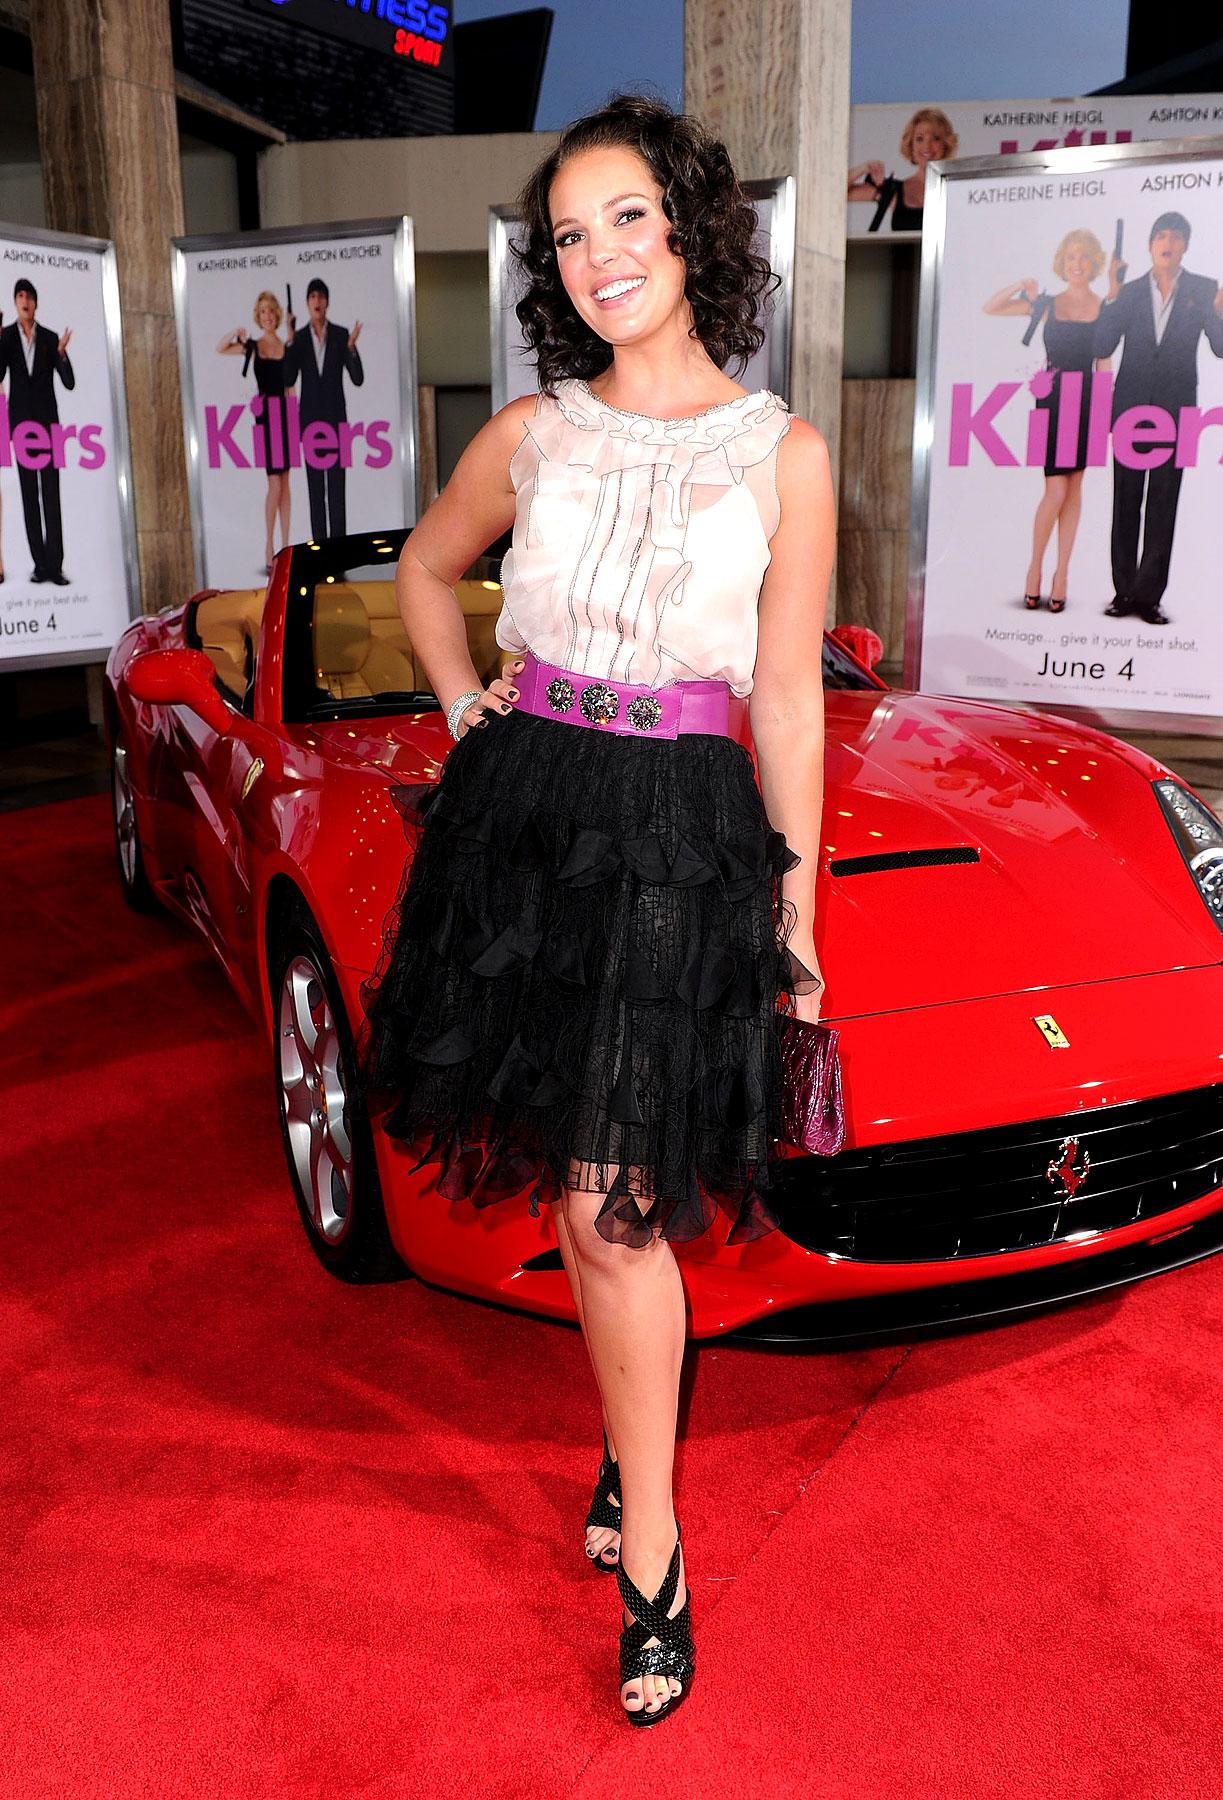 Katherine Heigl Fashion FAILs The 'Killers' Premiere (PHOTOS)